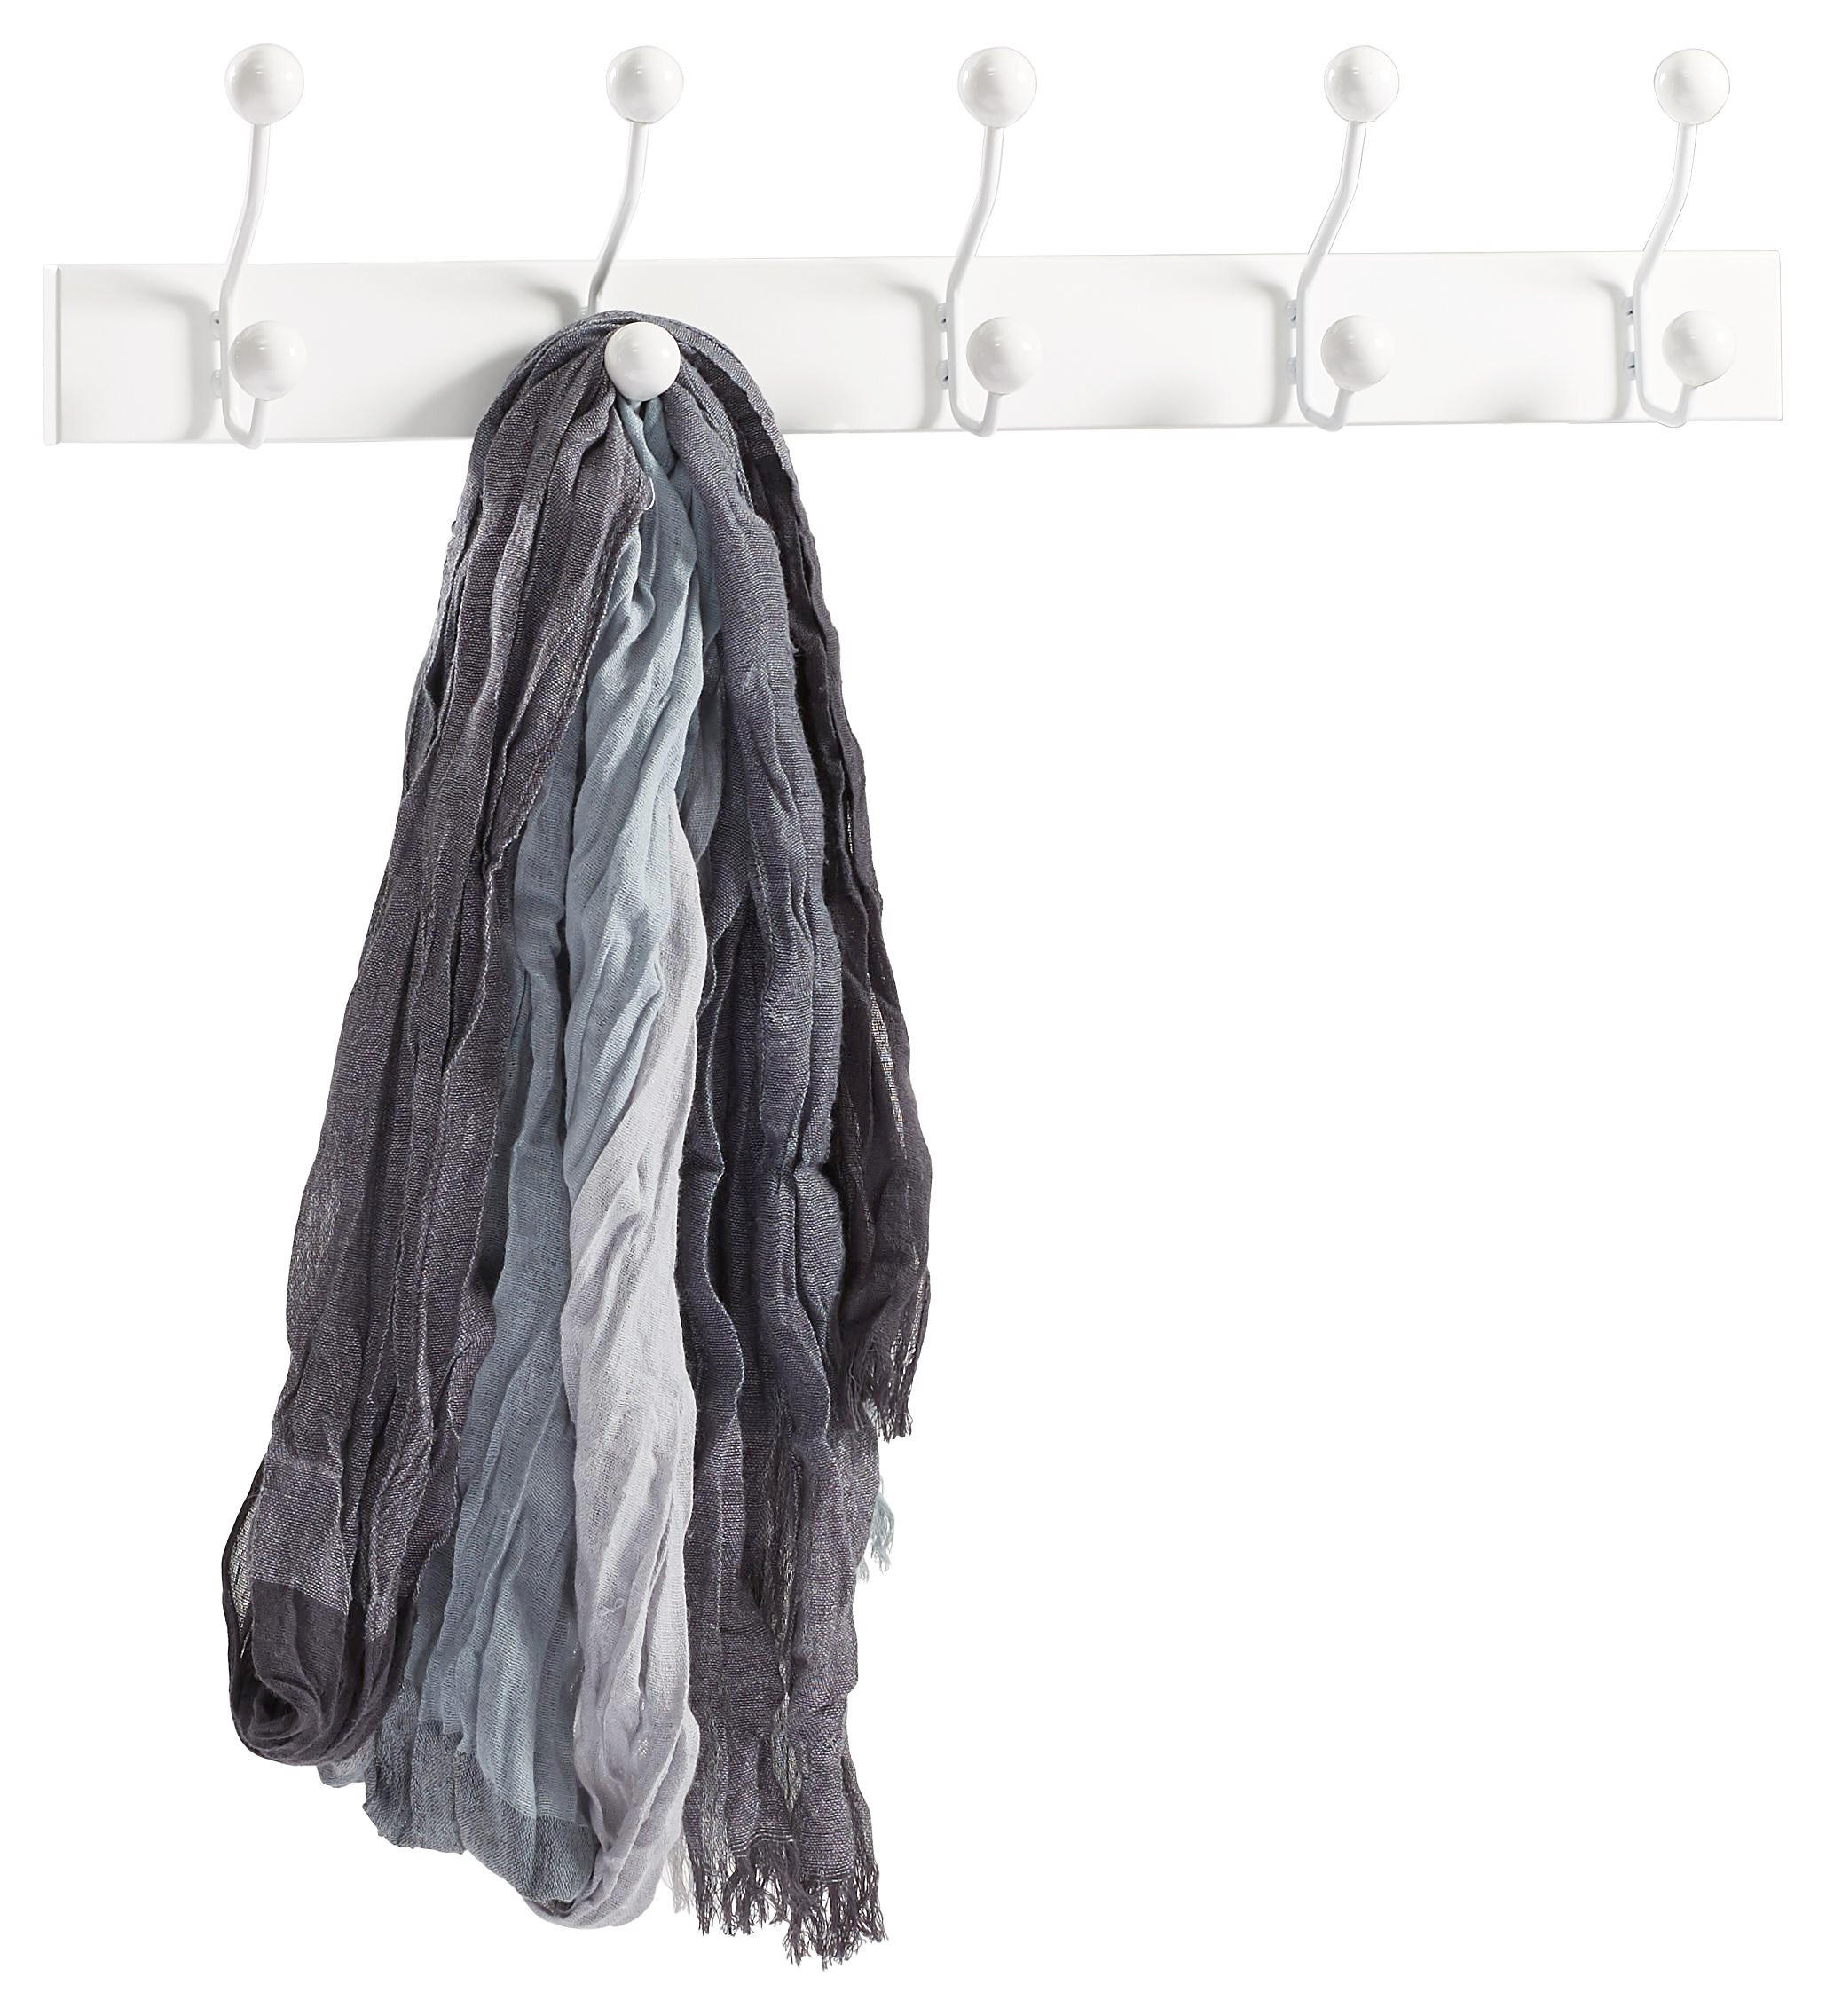 VJEŠALICA ZIDNA - bijela, Design, drvni materijal/metal (65/13/7cm) - LESNINA-XXXL